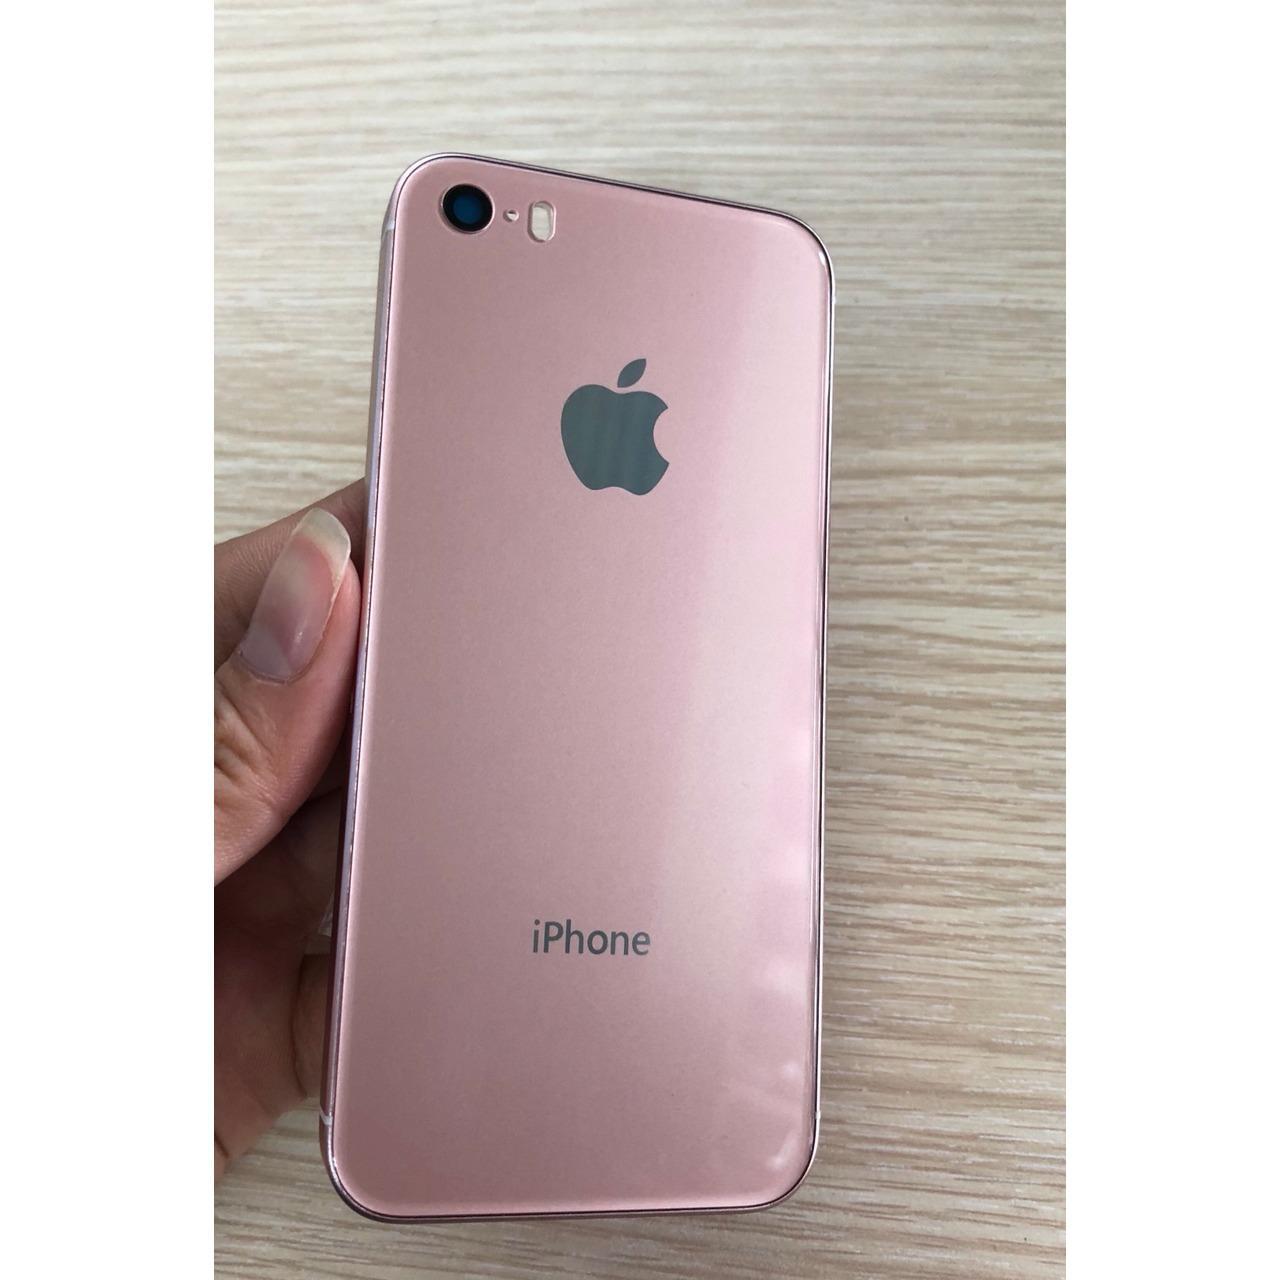 Mua Vỏ Iphone 5 5S Độ Len Vỏ Iphone 8 Apple Rẻ